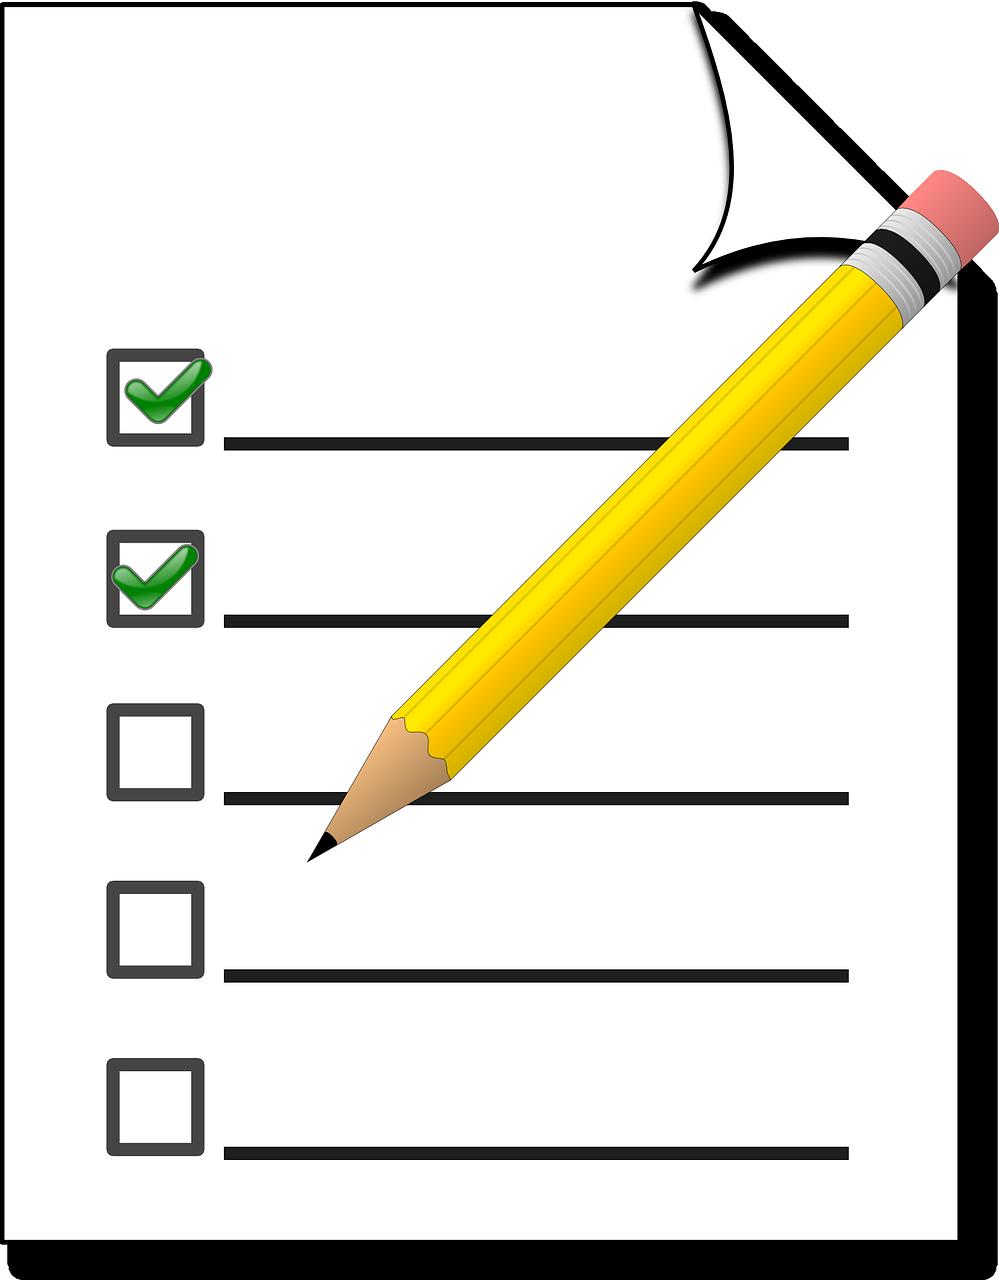 999x1280 The Friendly Reminder Eco Checklist